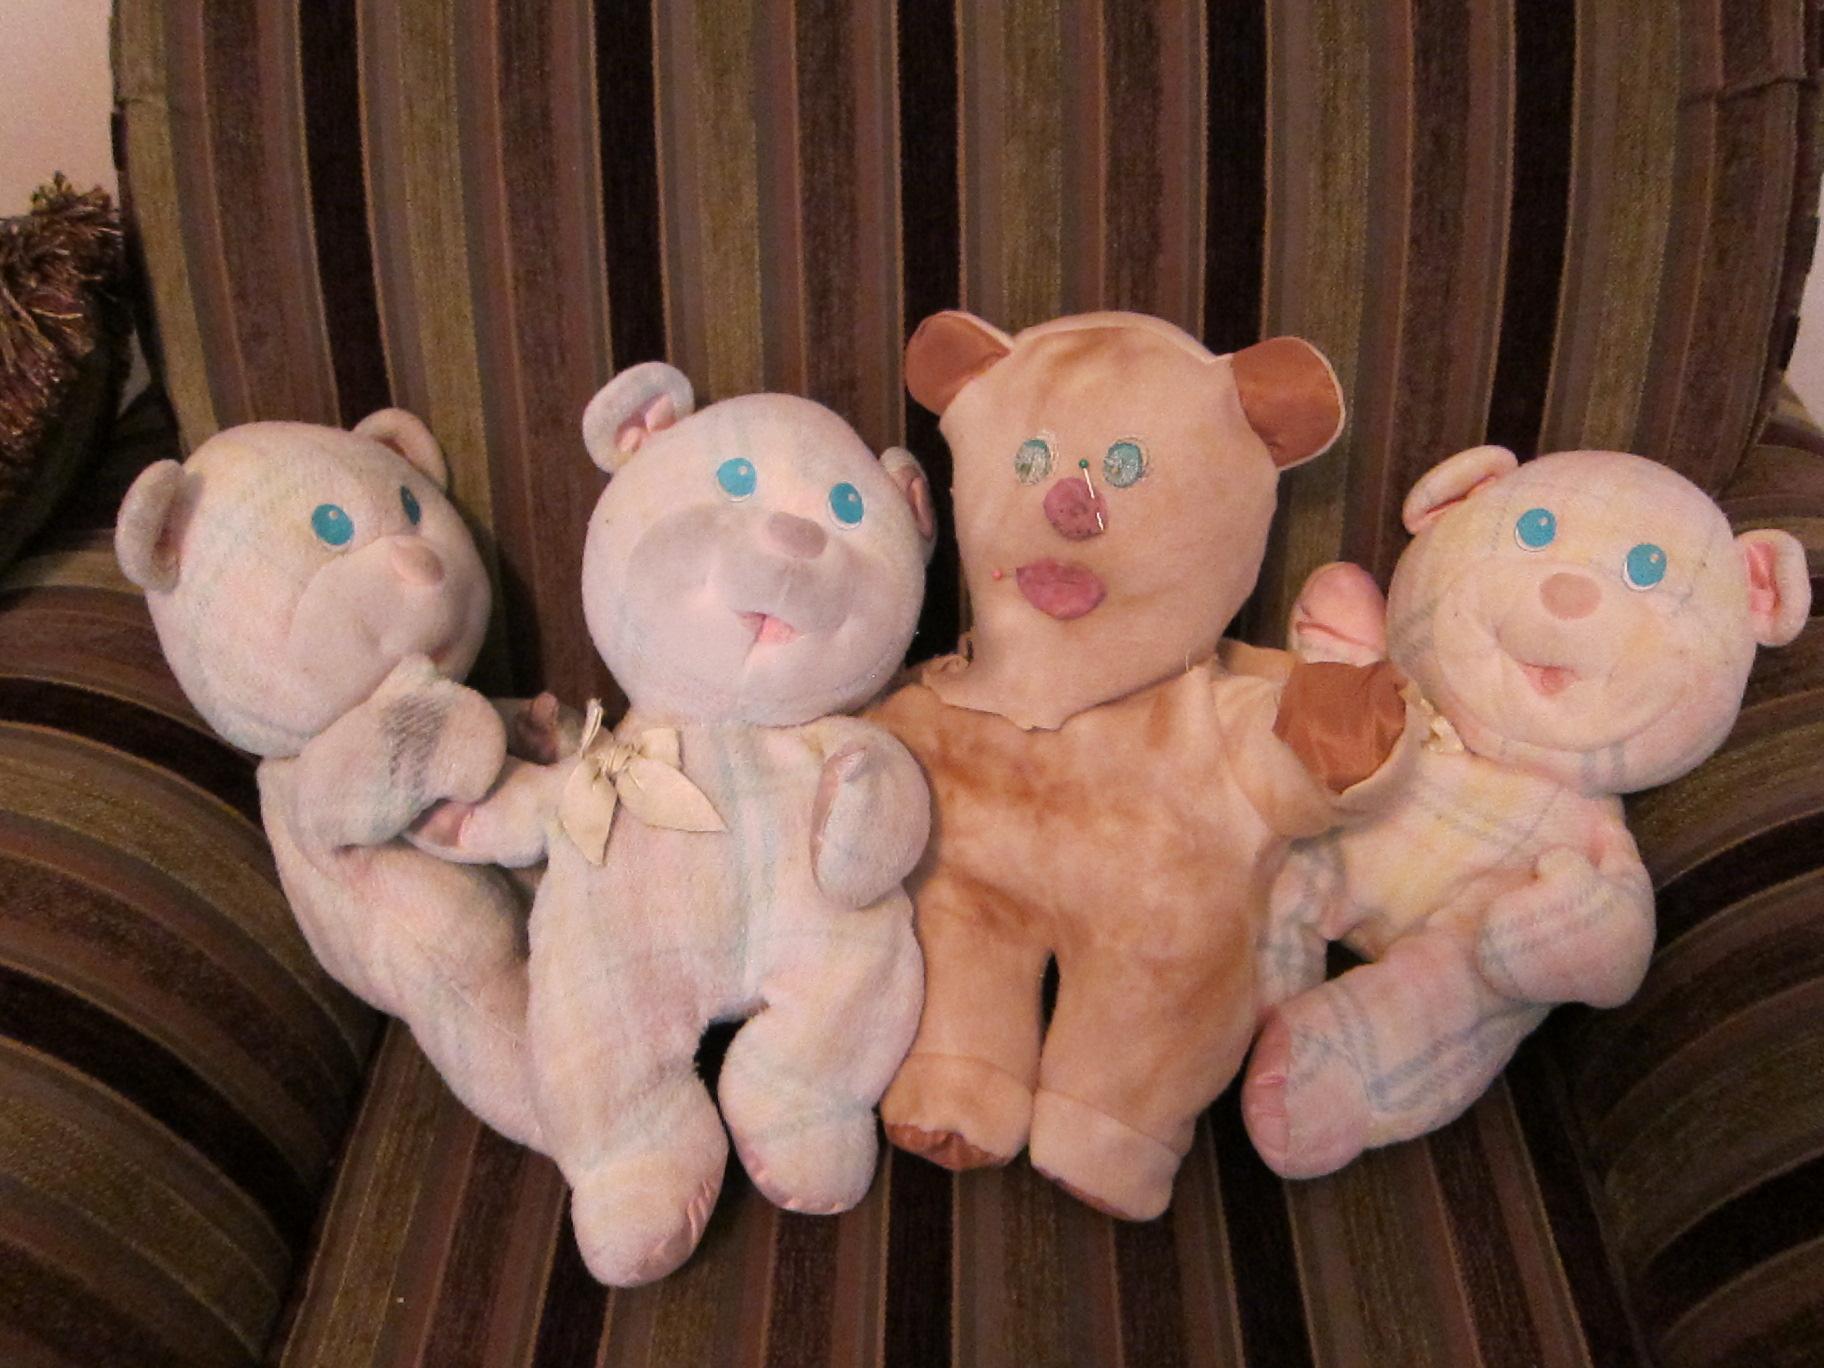 Fluffy's Friends